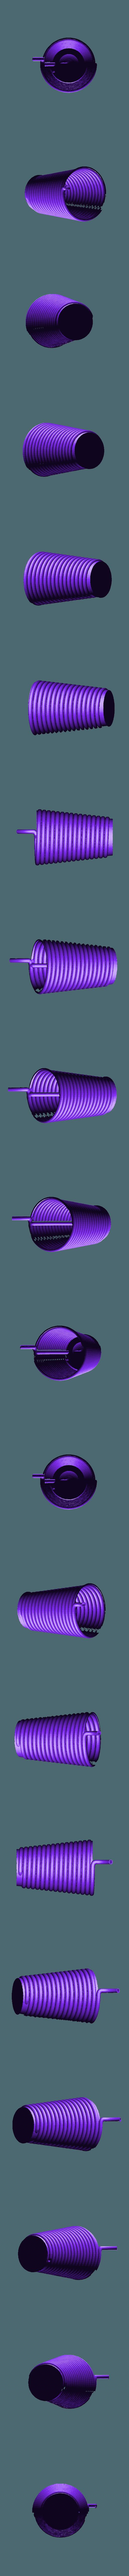 straw-glass-practical-v4-beta.stl Download free STL file Big StrawGlass - Practical • 3D print design, bLiTzJoN